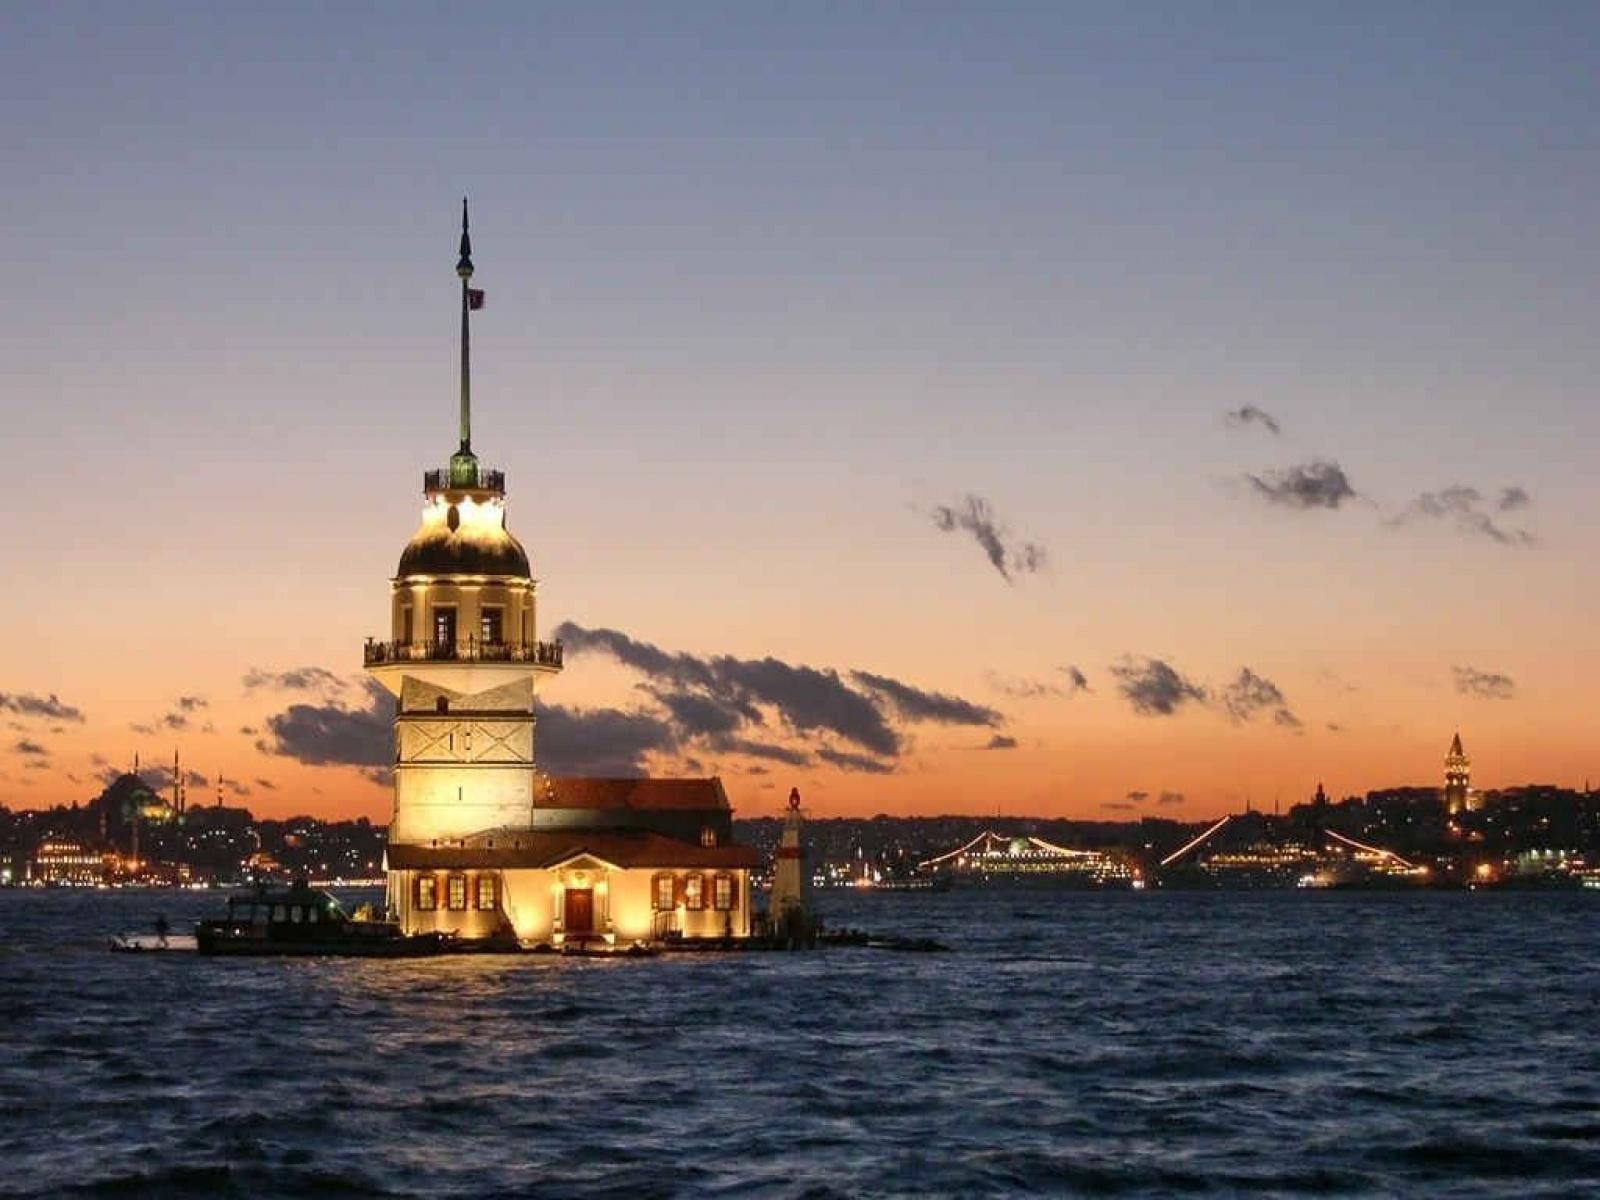 http://3.bp.blogspot.com/-lqP3EN4mvVk/T6VbOb7-isI/AAAAAAAAALE/wRUKBLvAvwU/s1600/ws_Leander_Tower_Istanbul_1600x1200.jpg